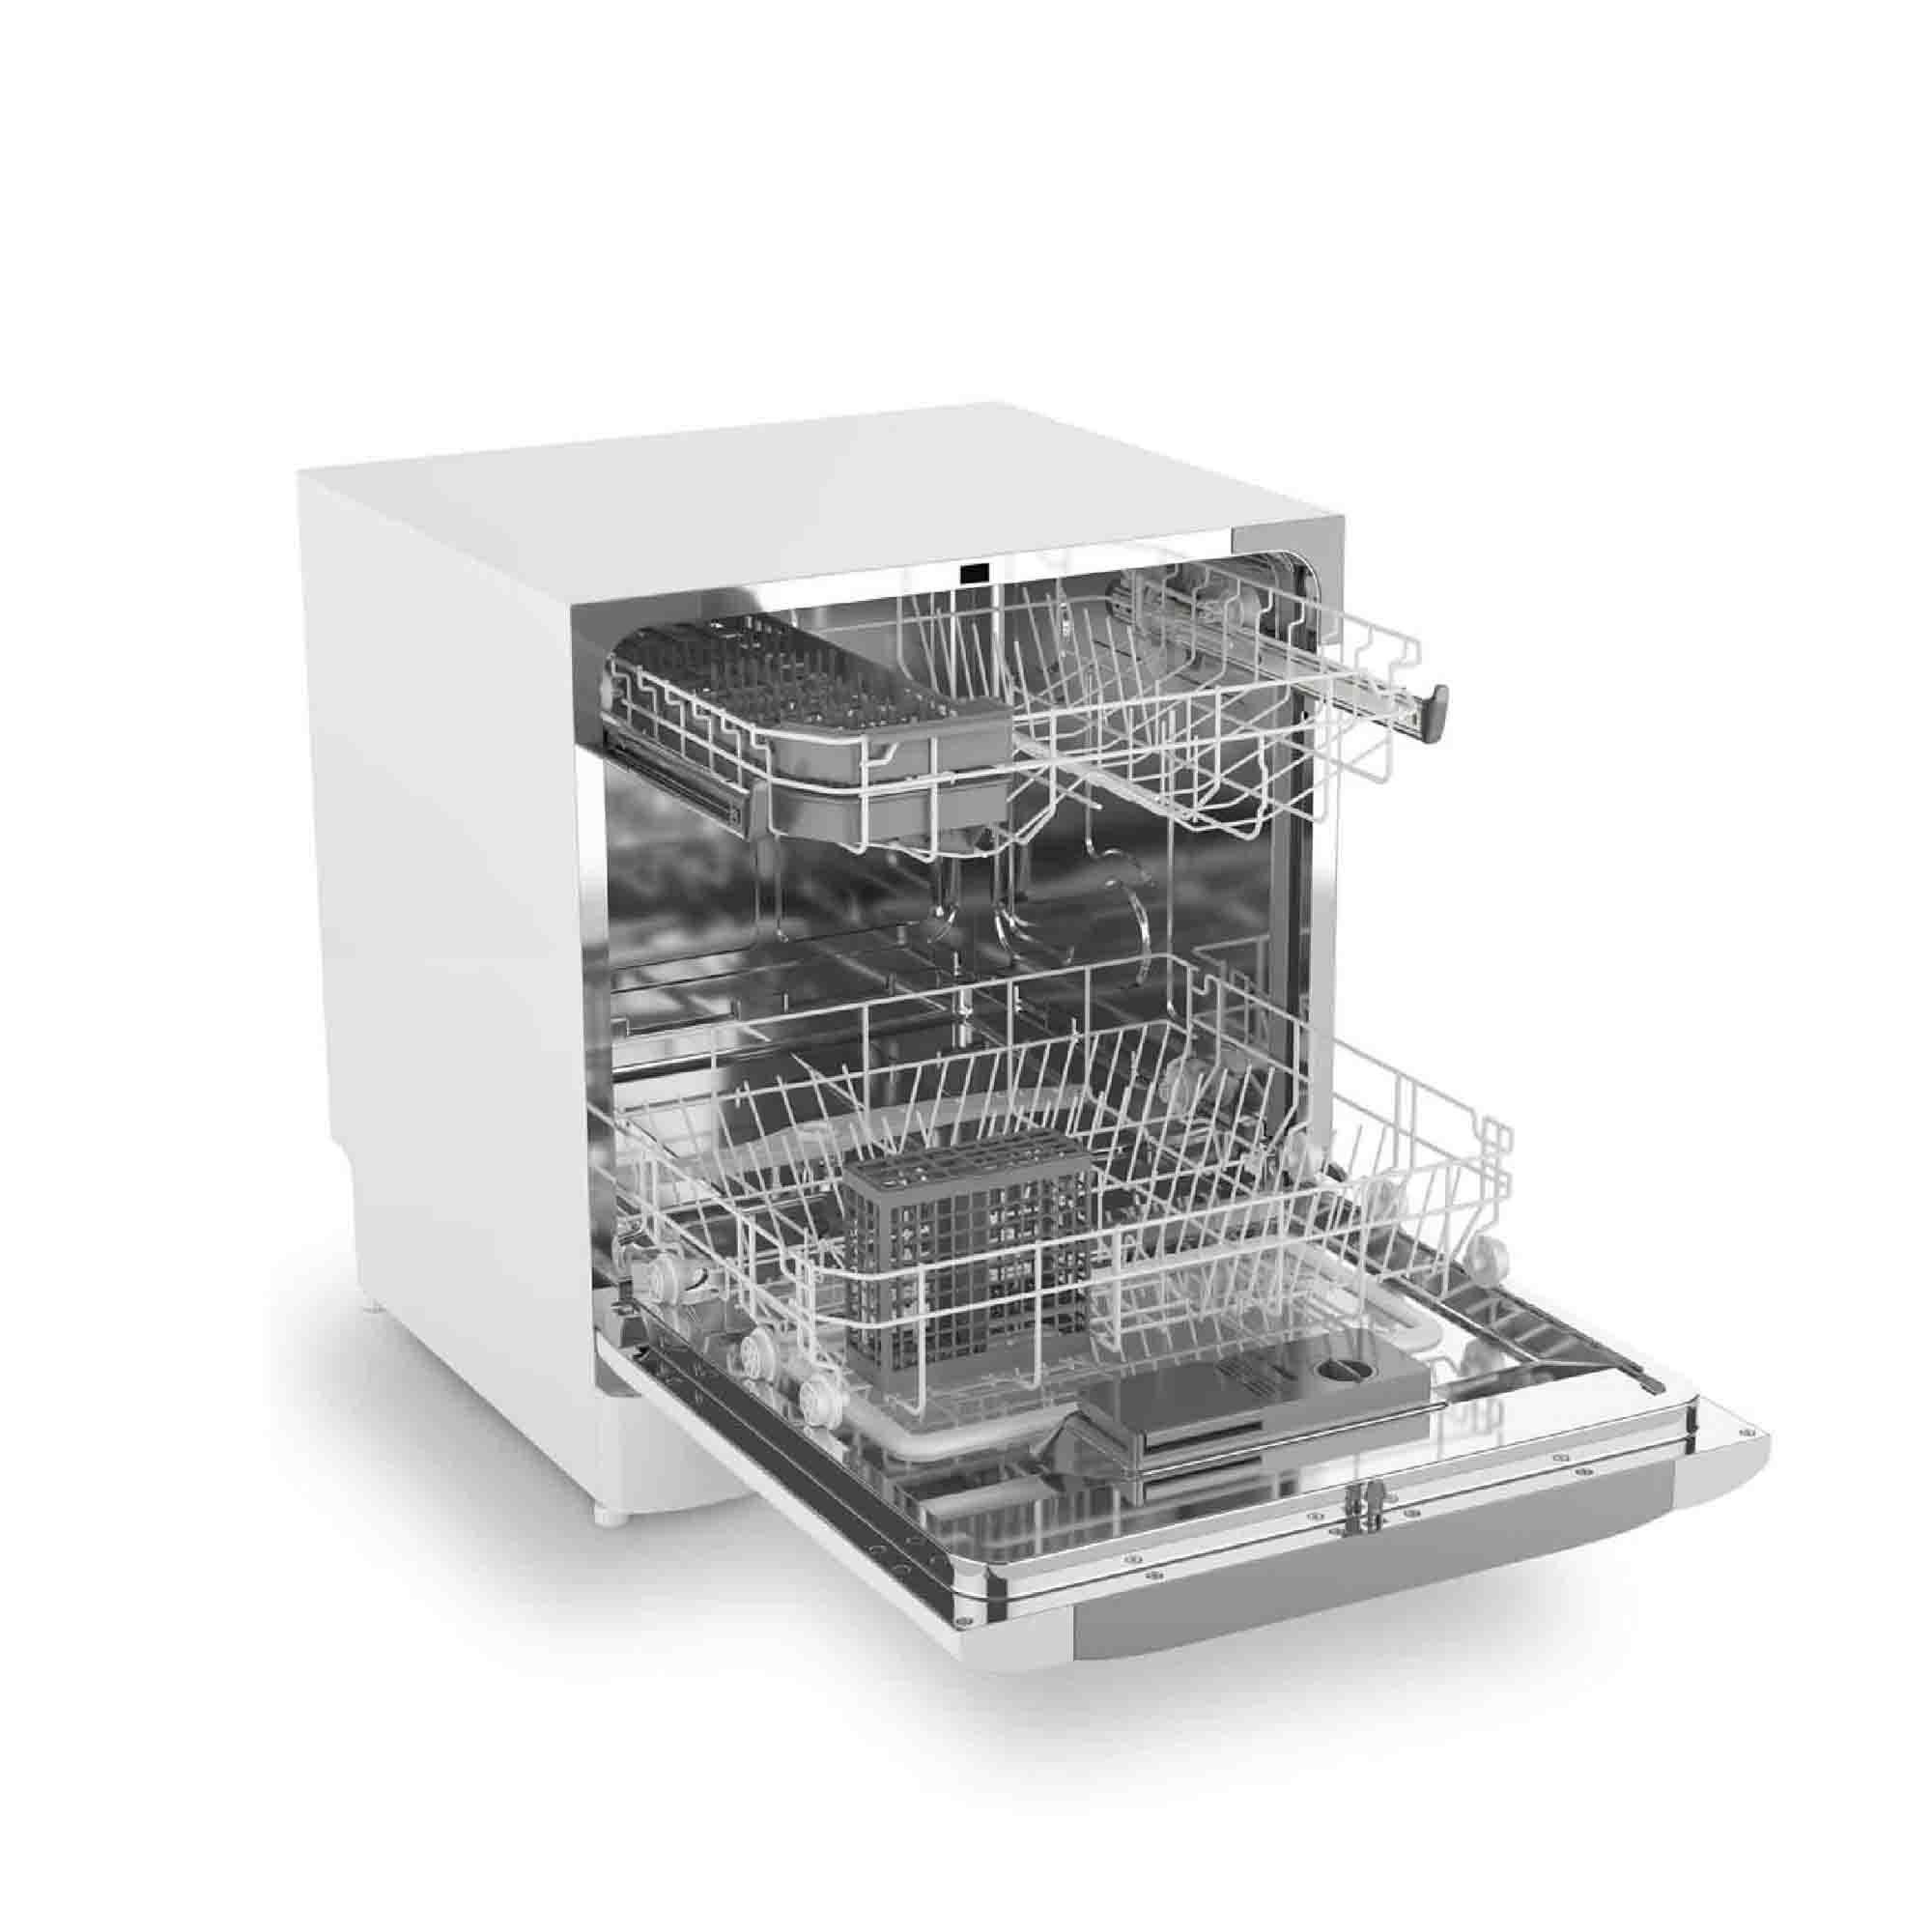 depth dishwashers countertops magic cmyk dishwasher n countertop b chef